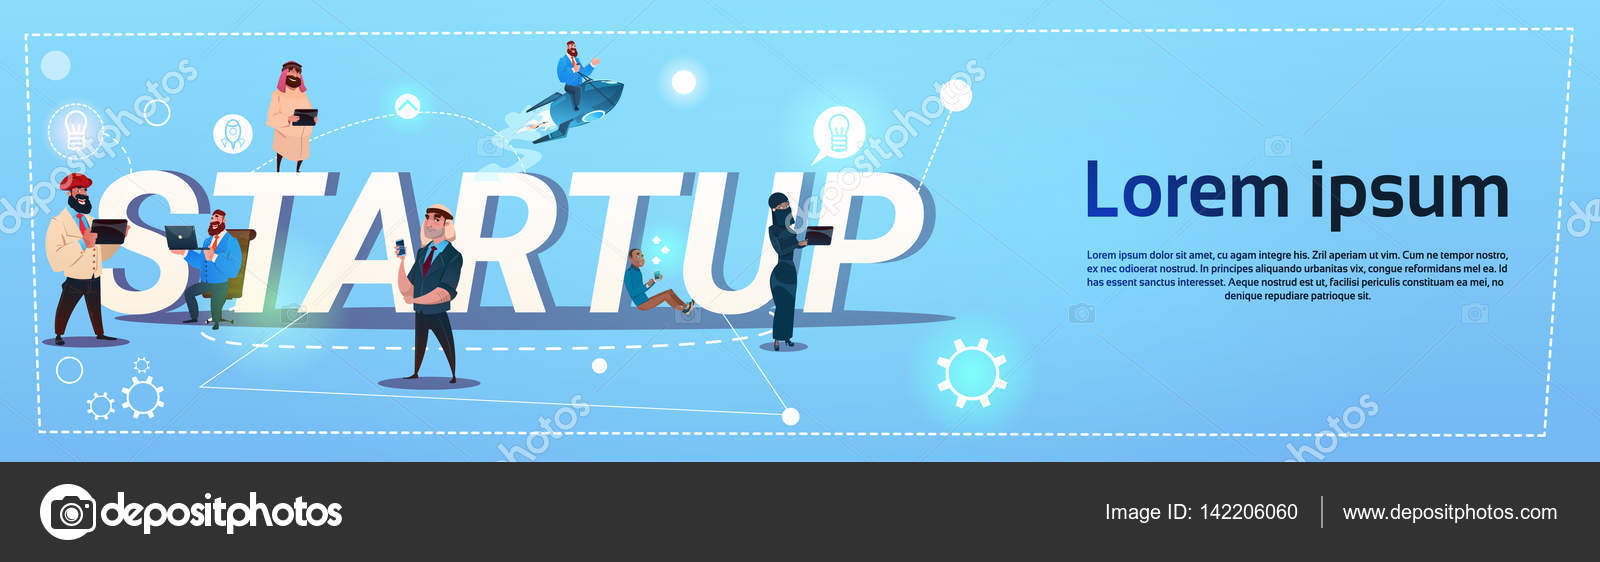 Geschäftsleute Gruppe neue Idee Konzept kreativen Brainstorming ...